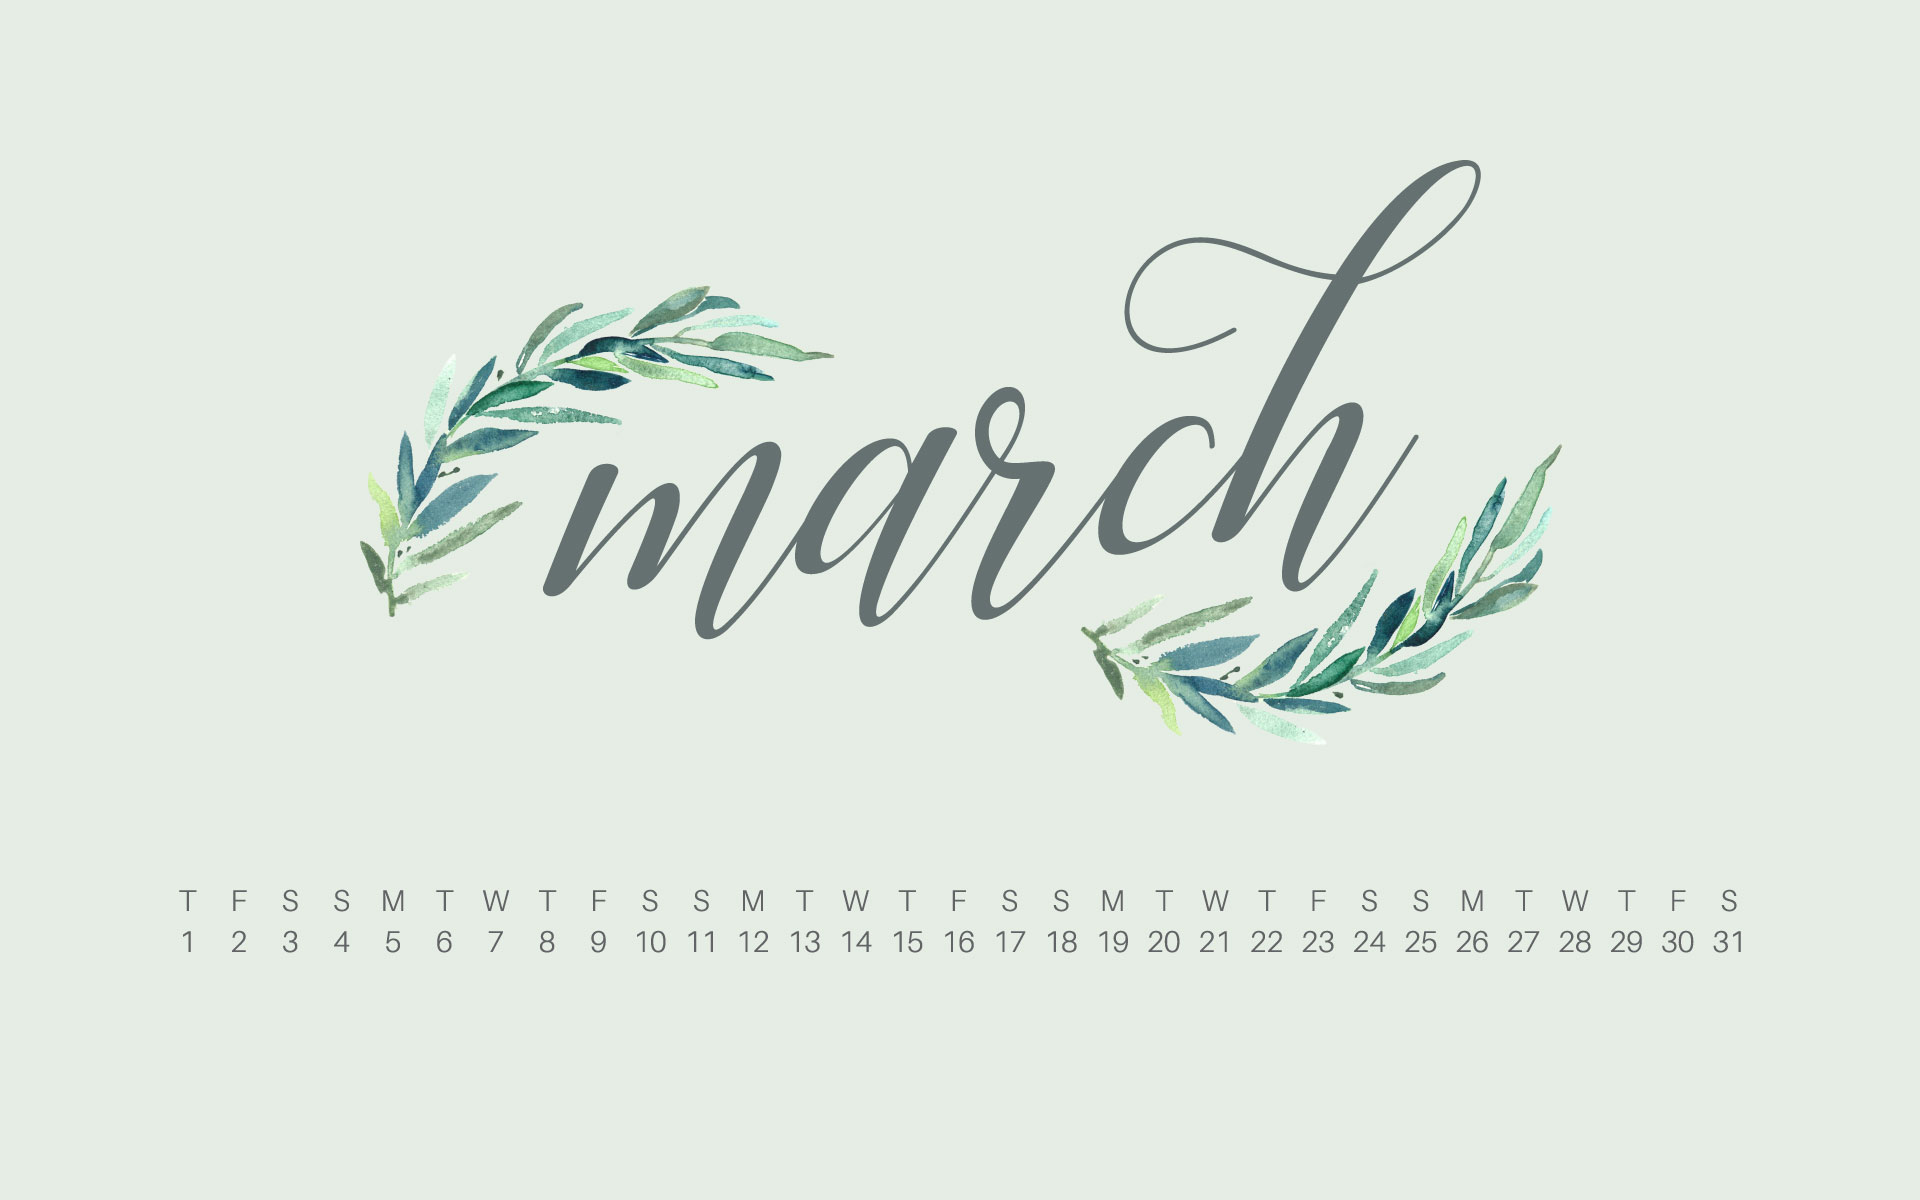 Uppercase Designs March 2018 Desktop Calendar Wallpaper